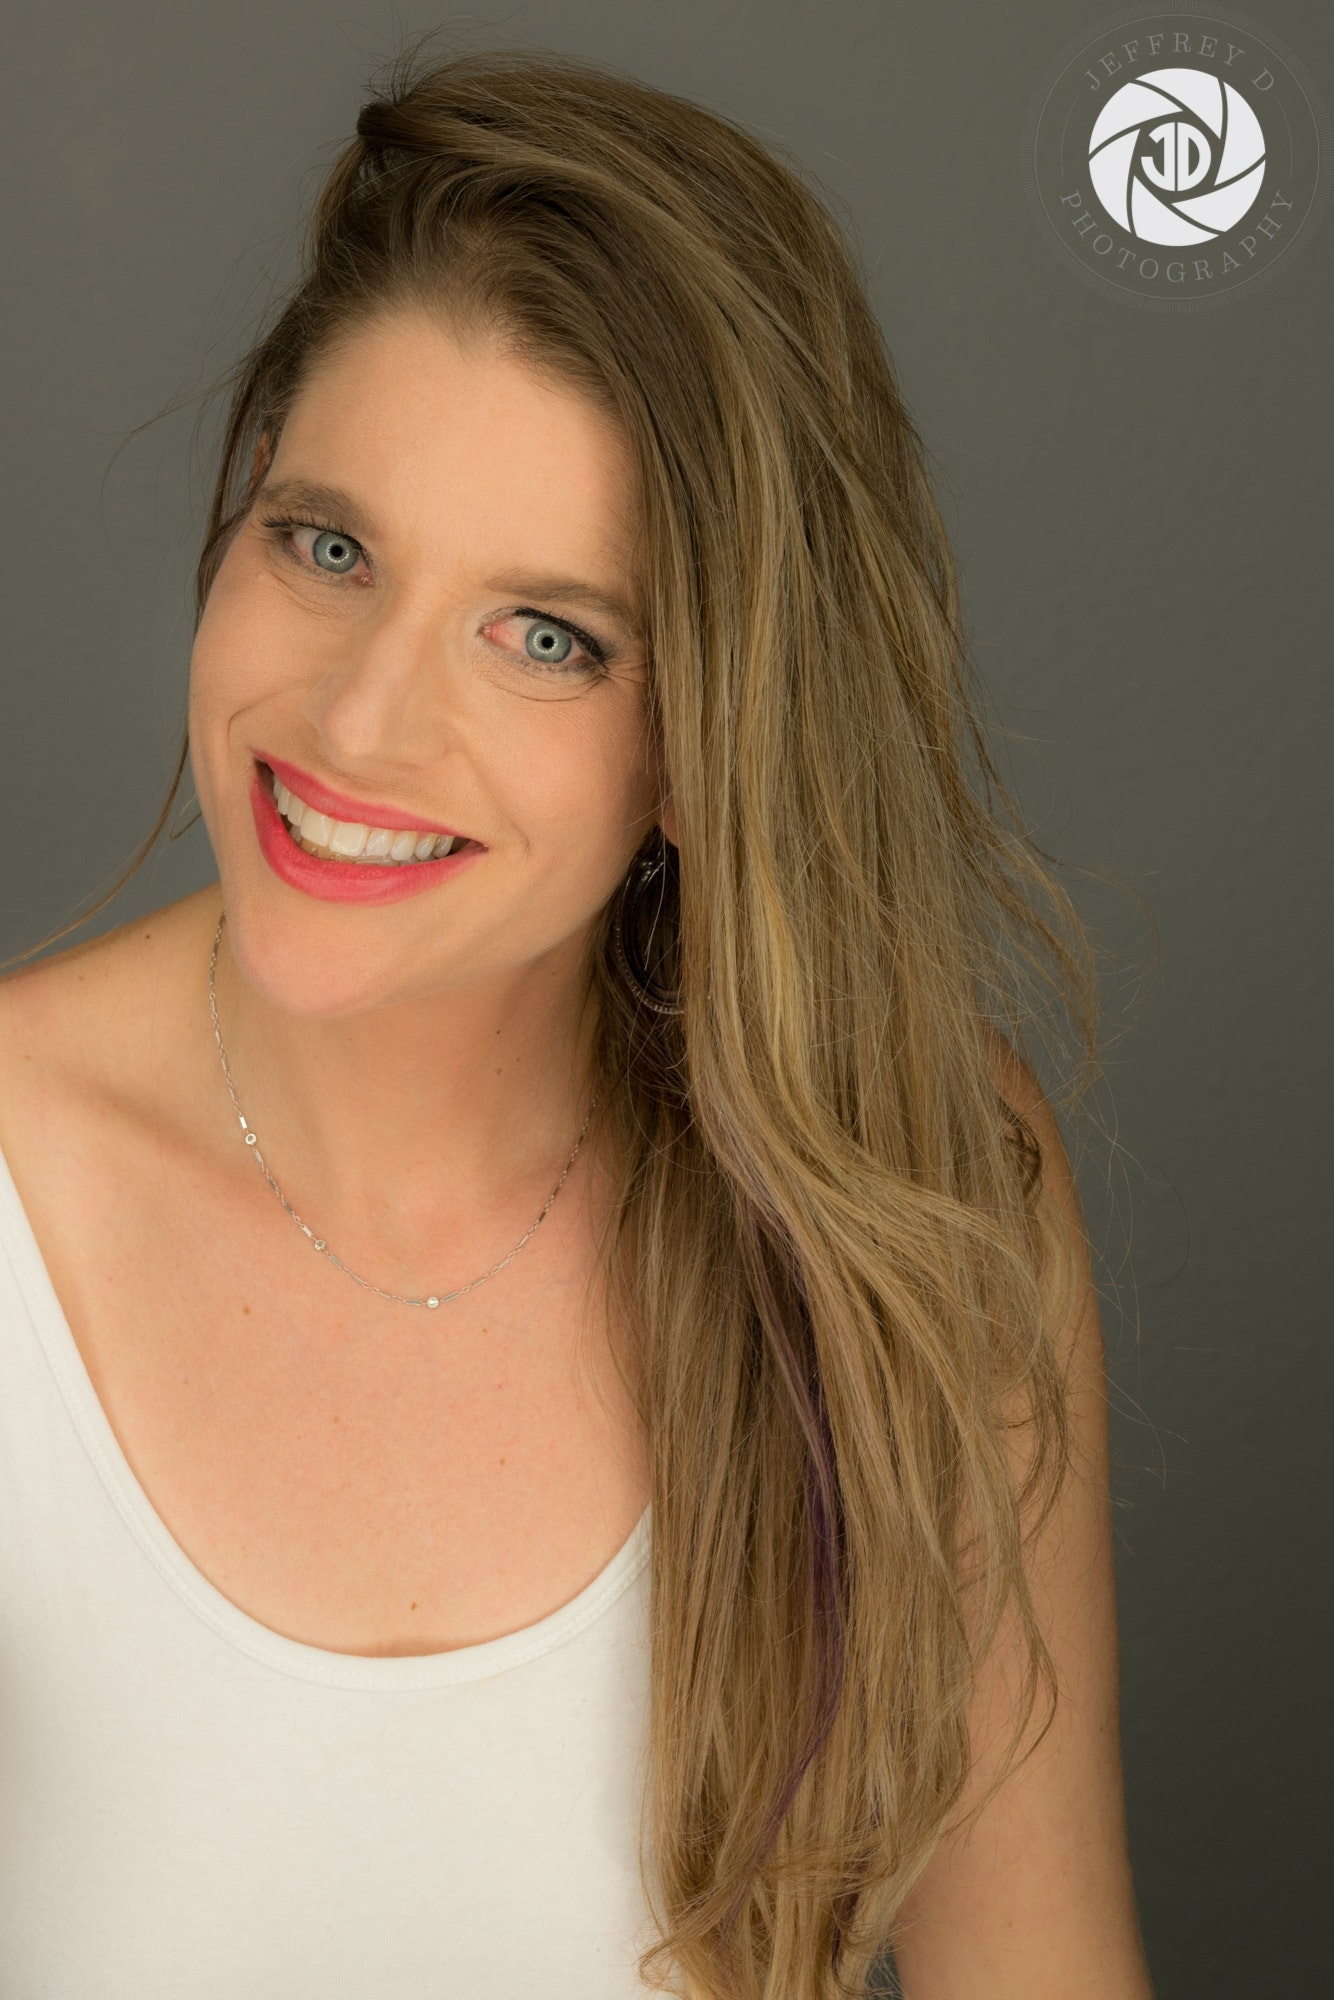 Amanda Dwyer's Model portfolio